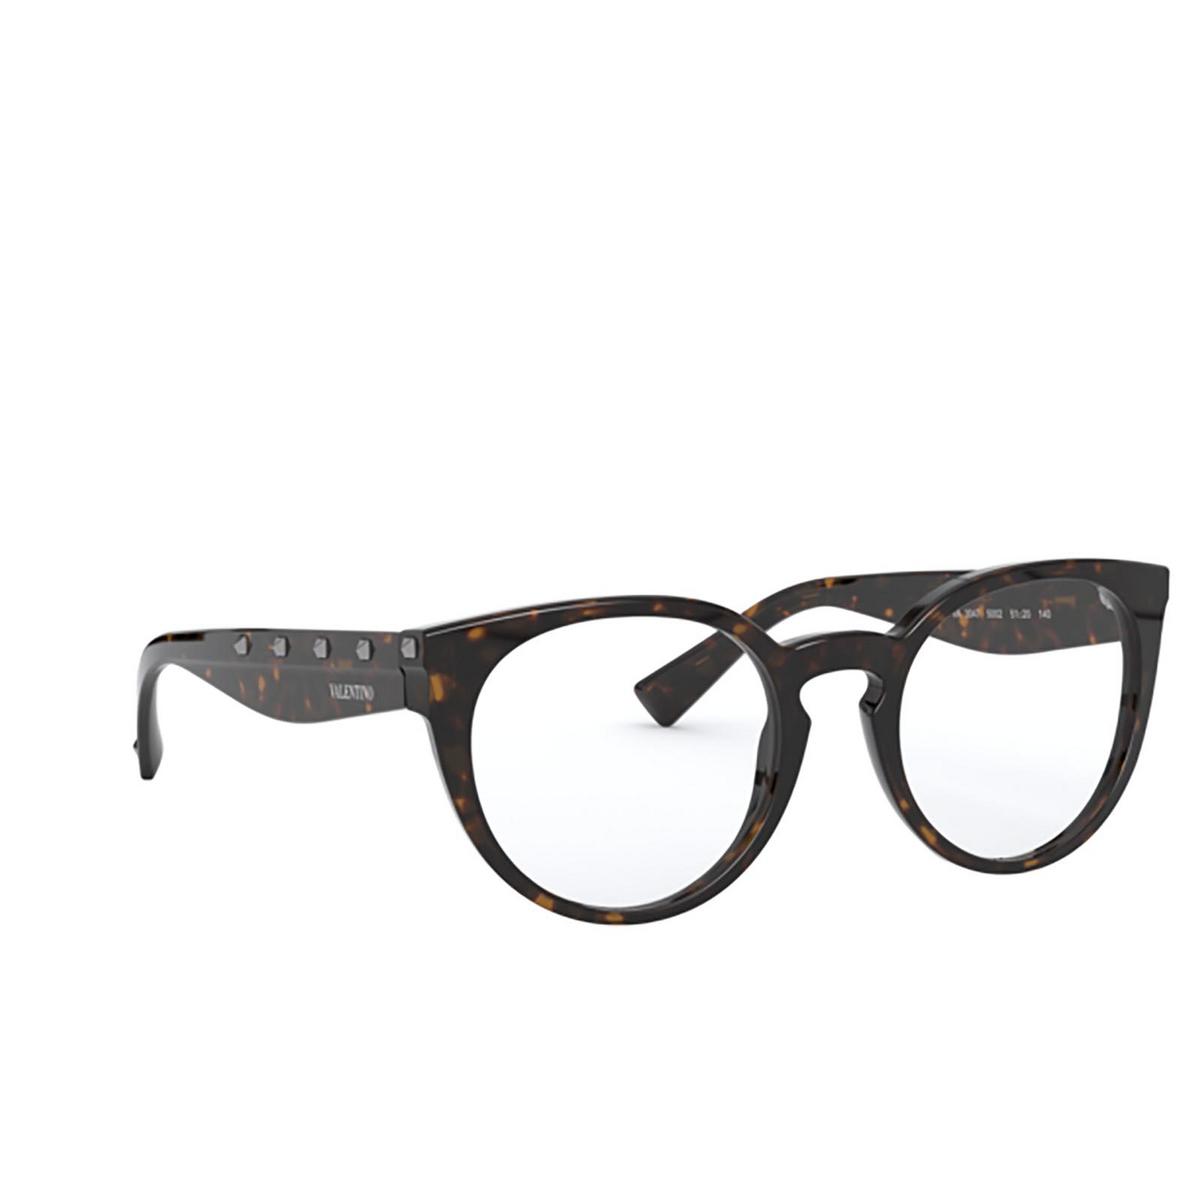 Valentino® Round Eyeglasses: VA3047 color Havana 5002 - three-quarters view.